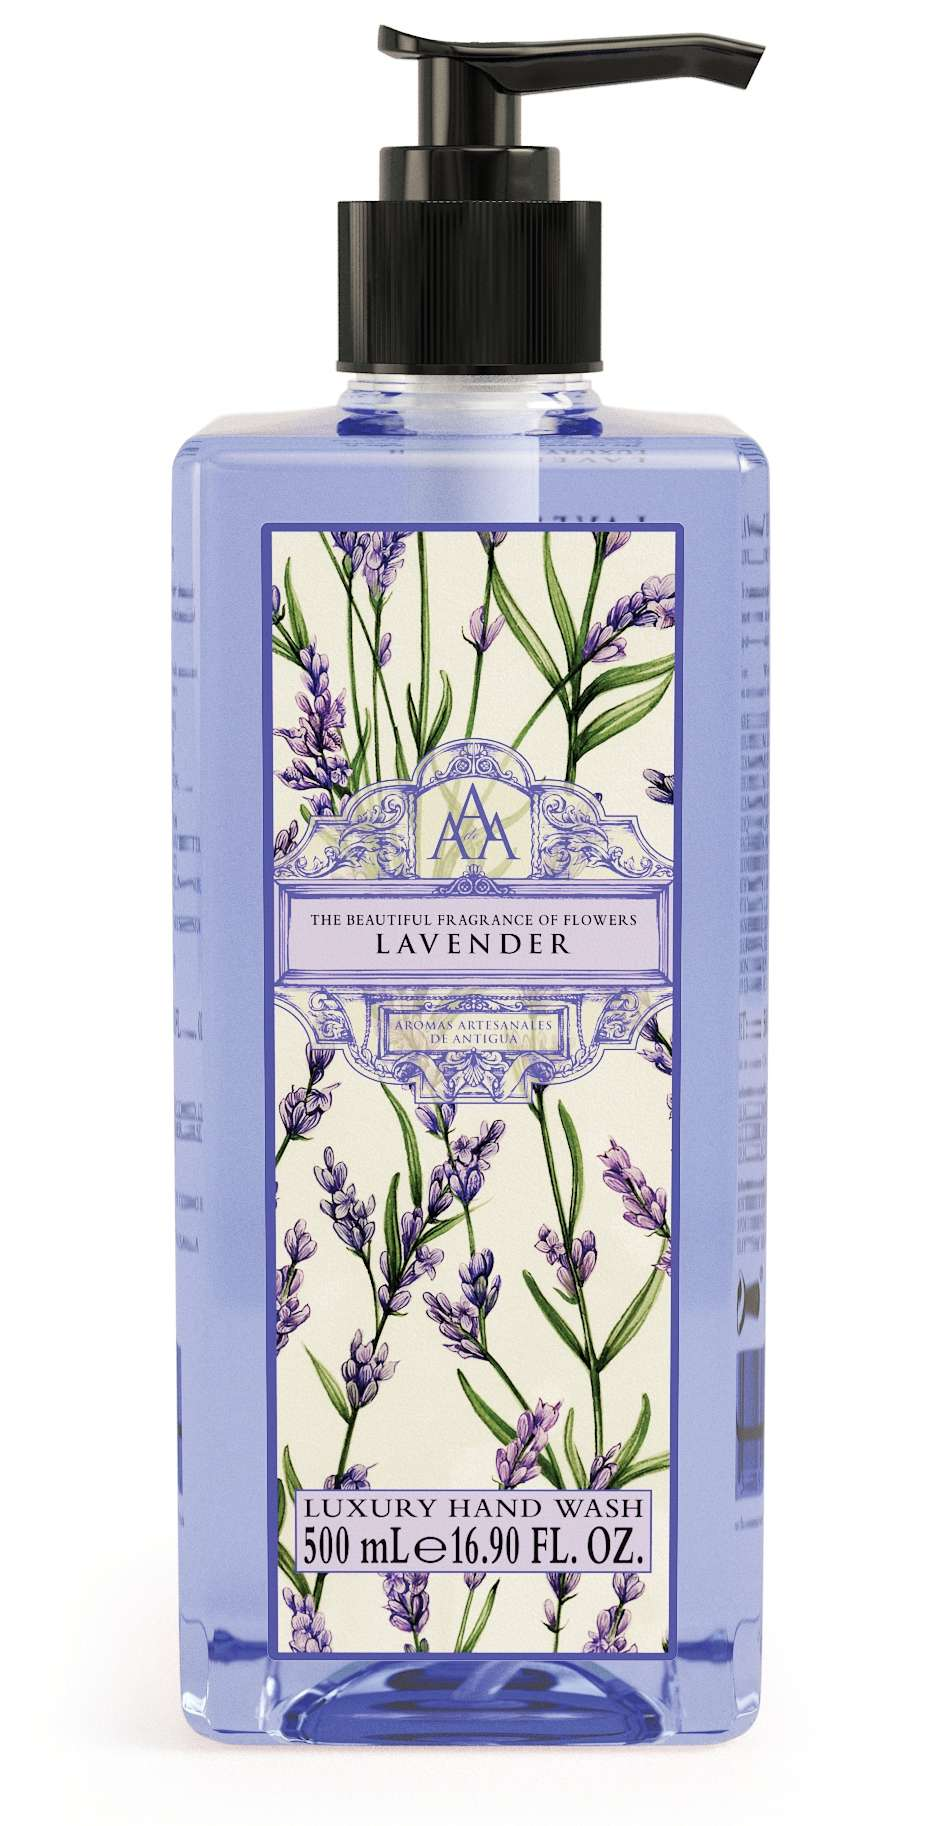 AAA Lavender hand wash